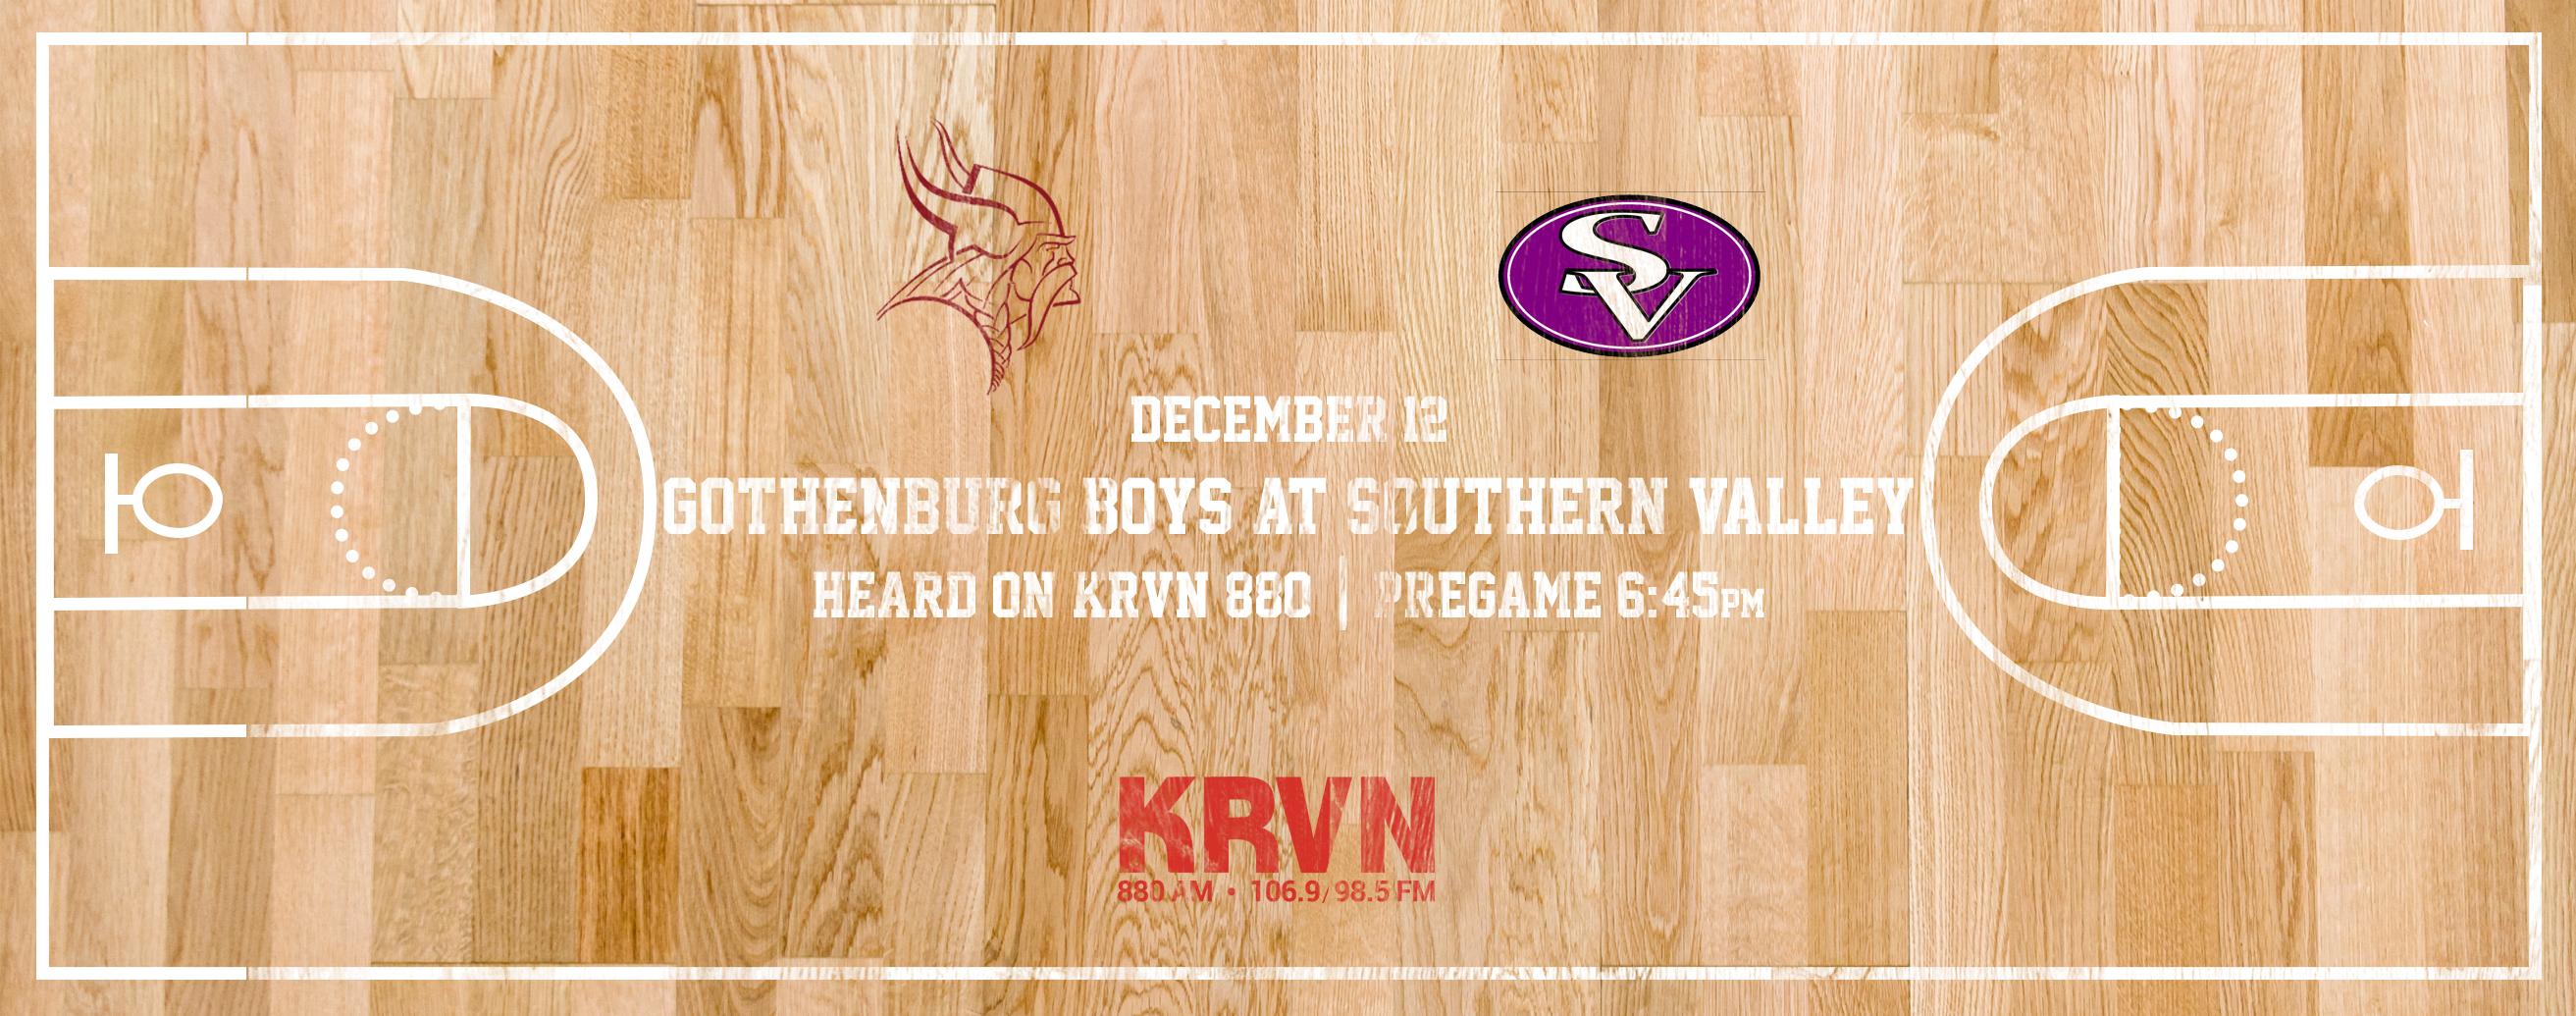 HS Basketball: KRVN AM Boys